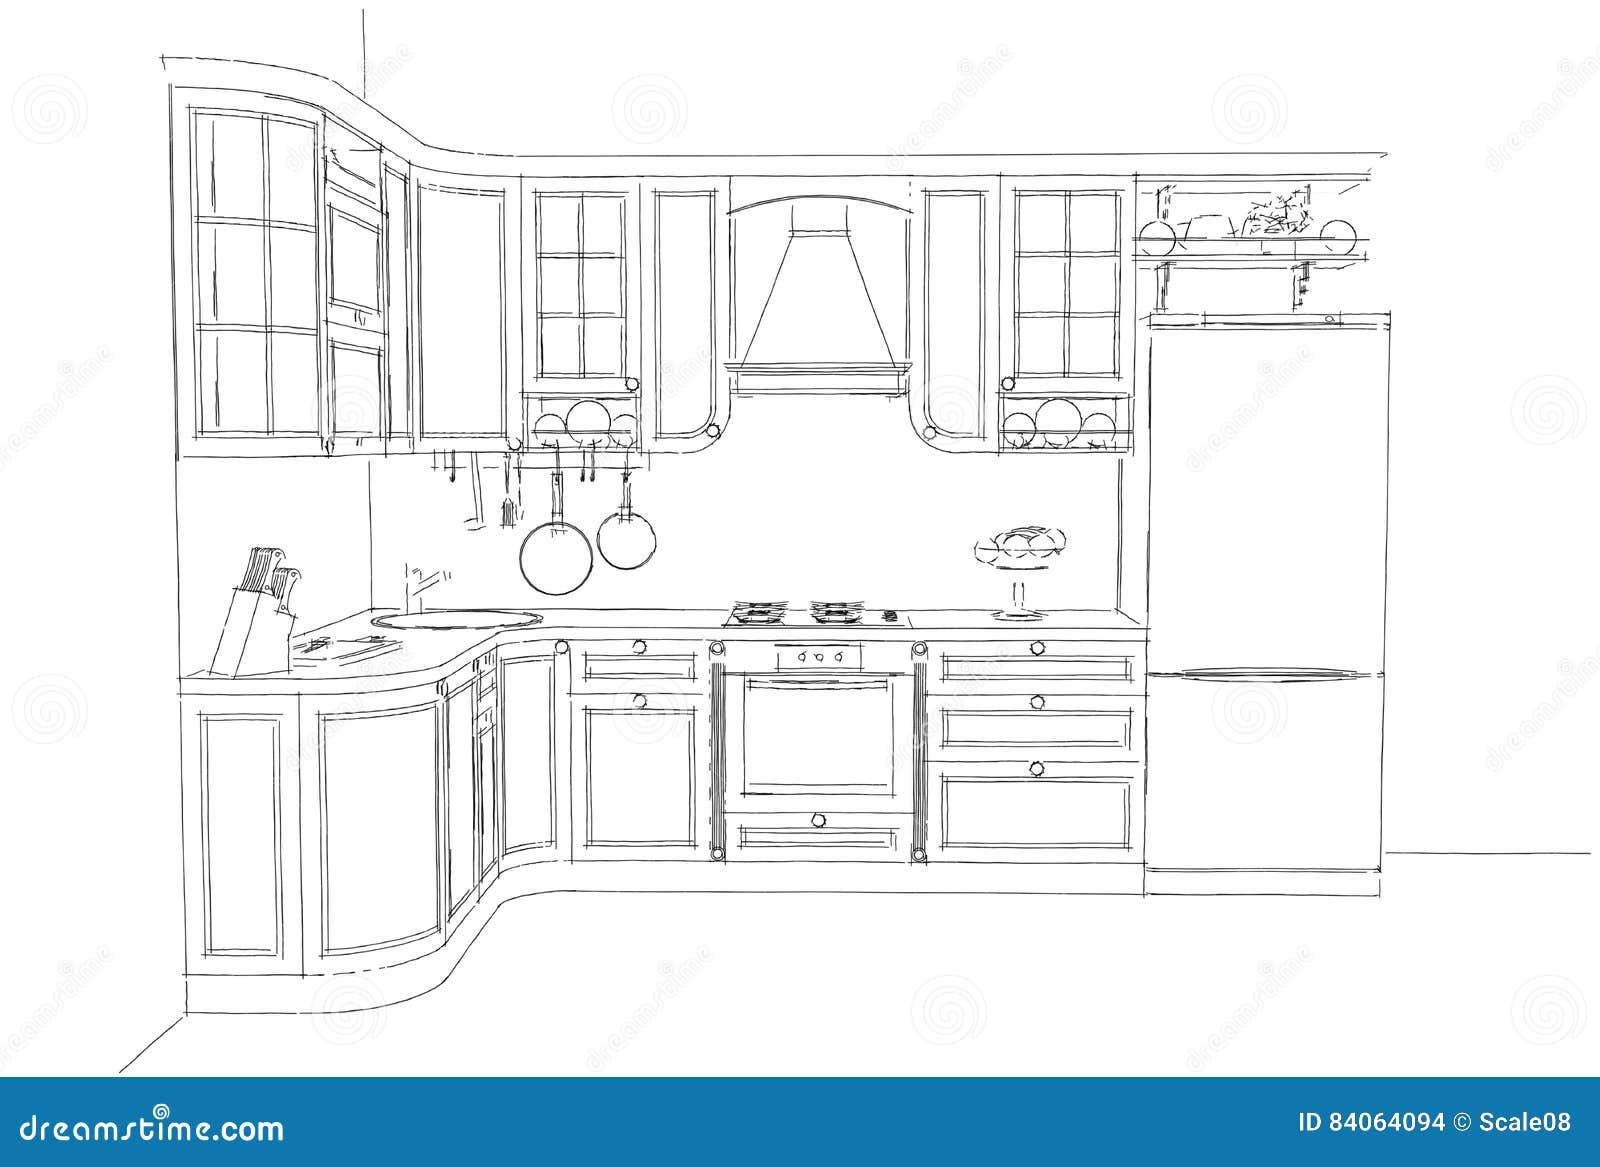 Nakreślenie rysunek klasyczny kuchenny wnętrze 3d